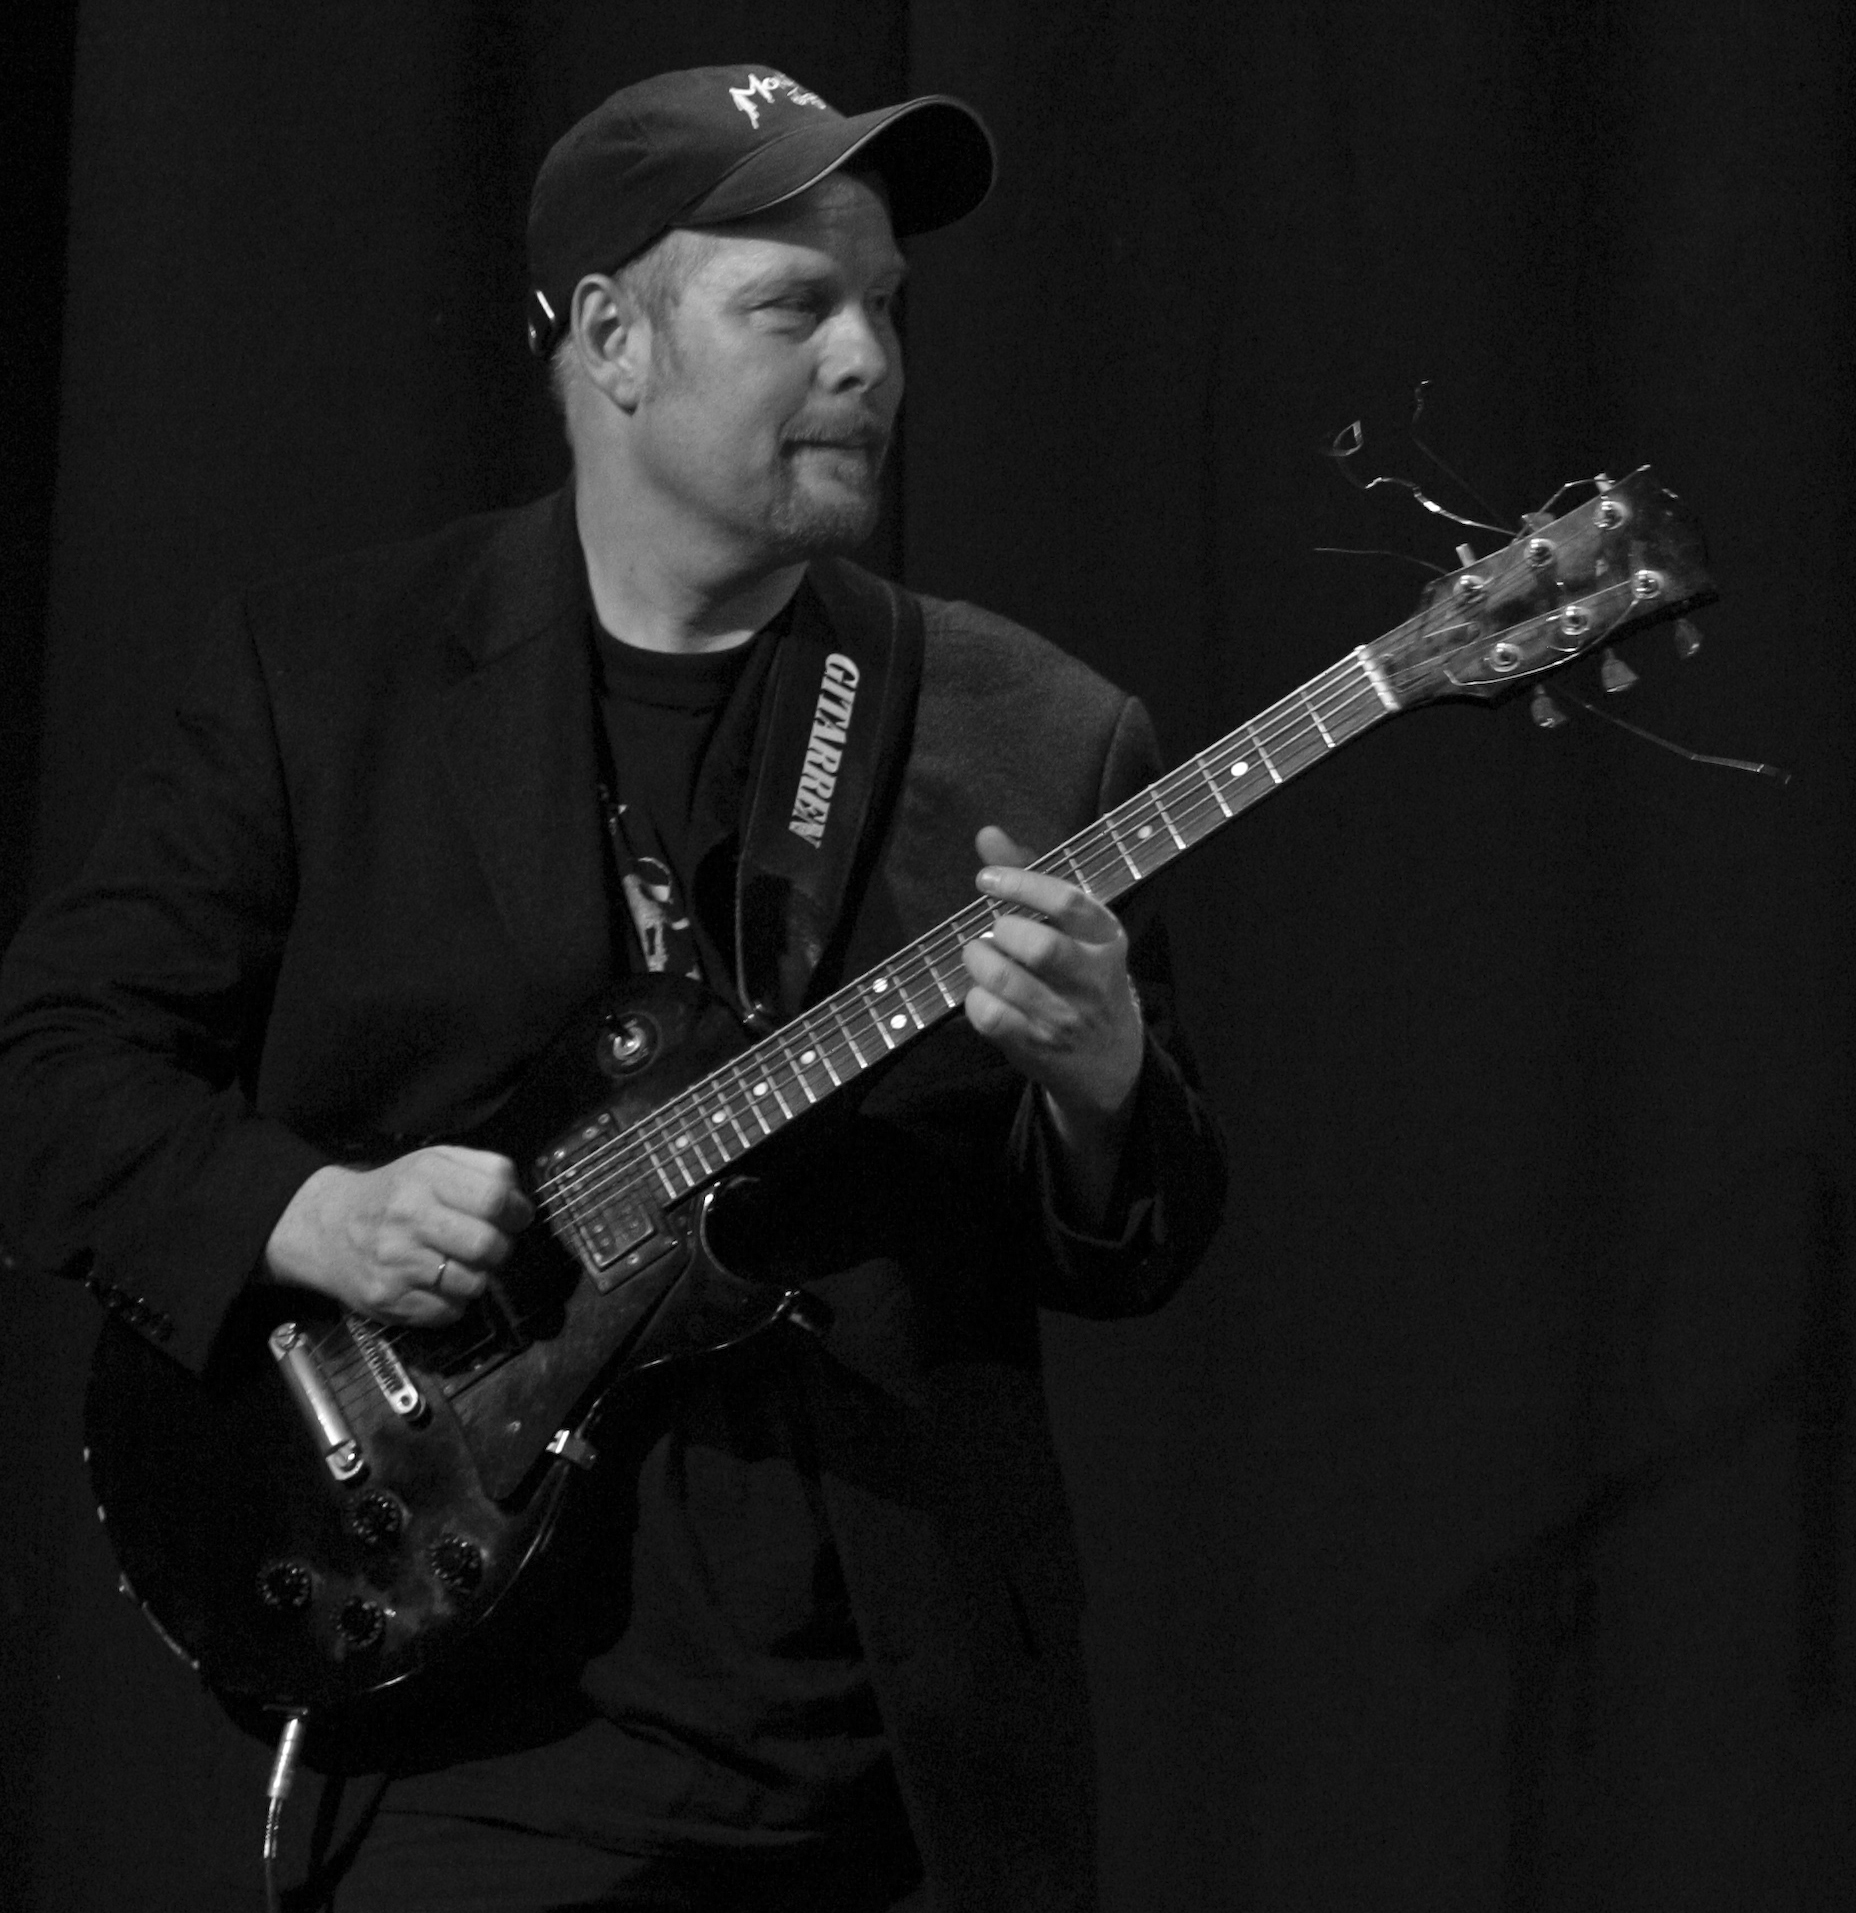 Ulf Wakenius (Guitar) on Copenhagen Jazzhouse 2005, Copenhagen, Denmark